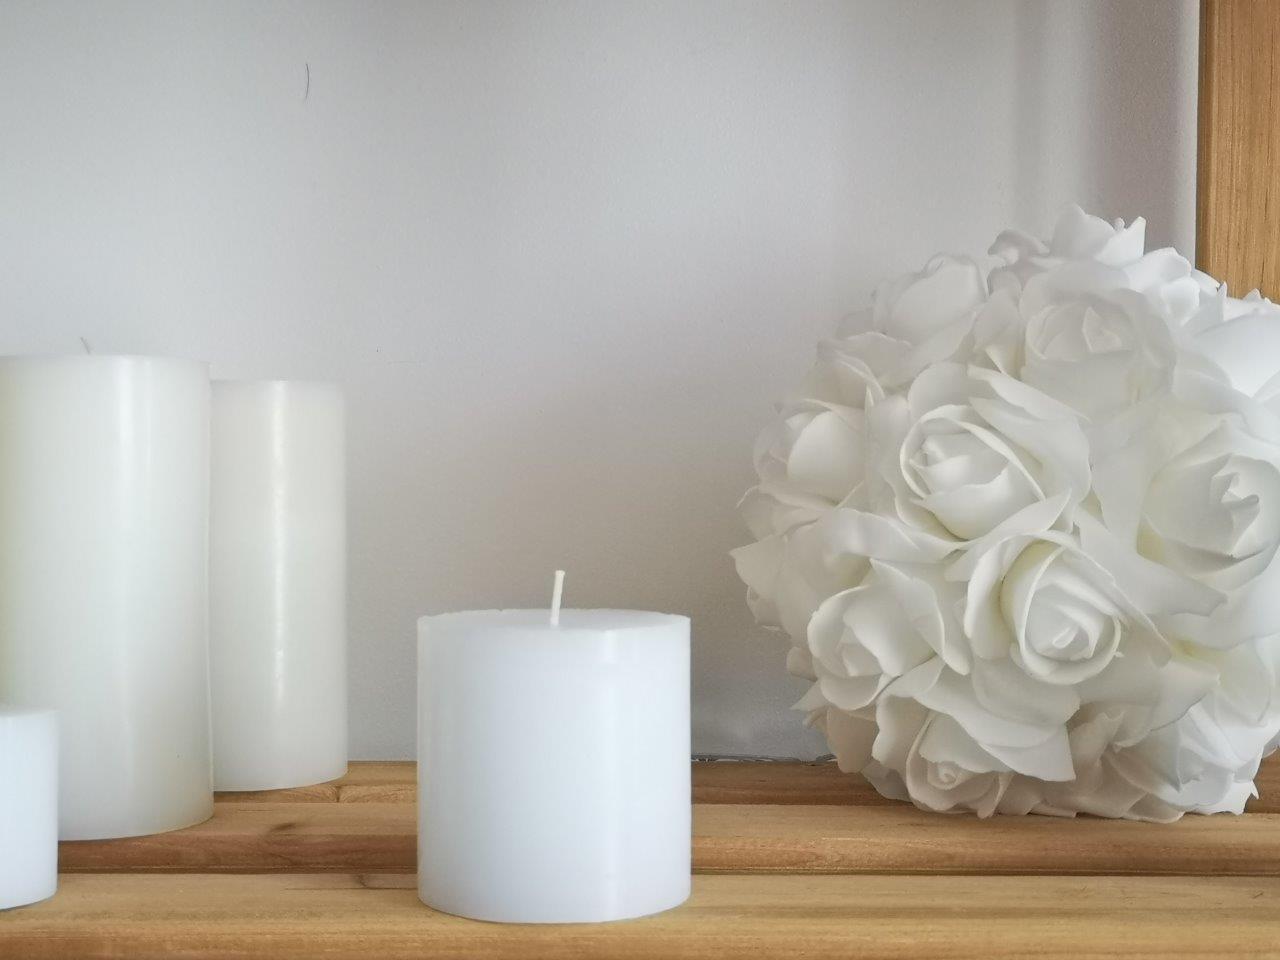 White Pillar Candle Small White-Pillar-Candle-Small